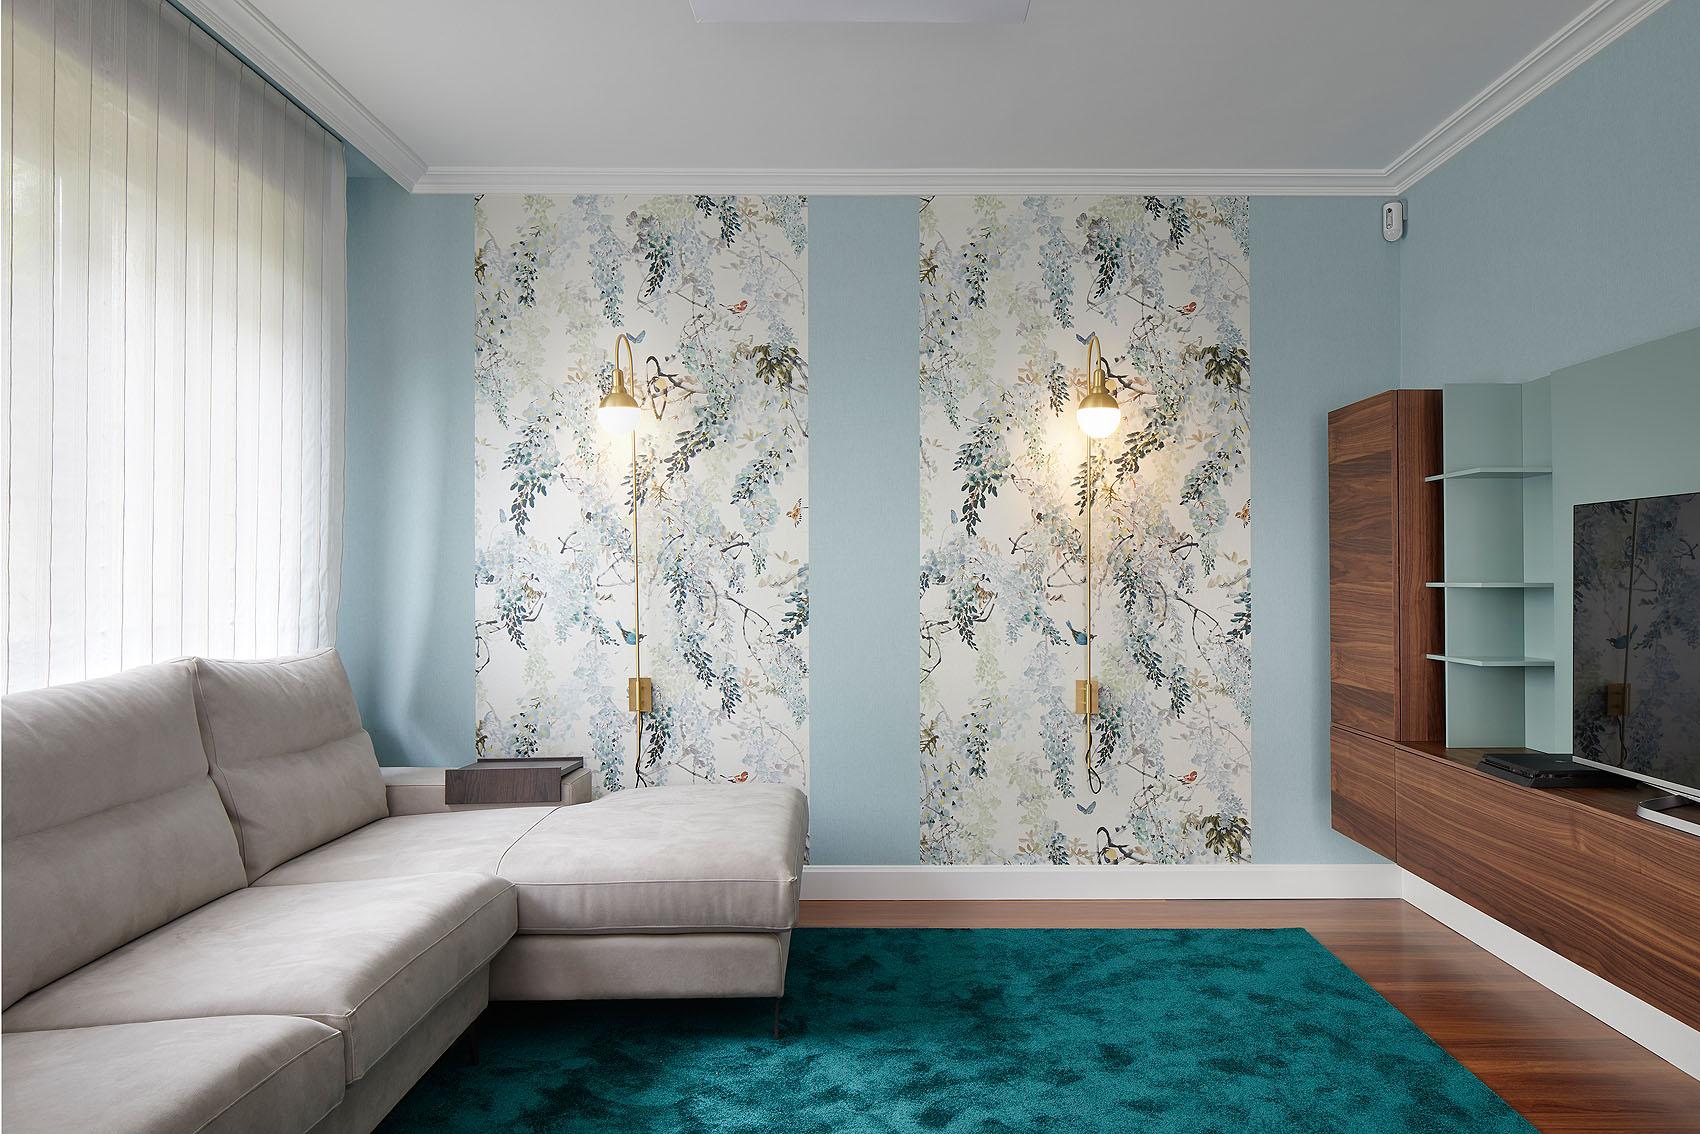 Casa Urdin por Mugarri Interiorismo - Iñaki Caperochipi - Fotografía